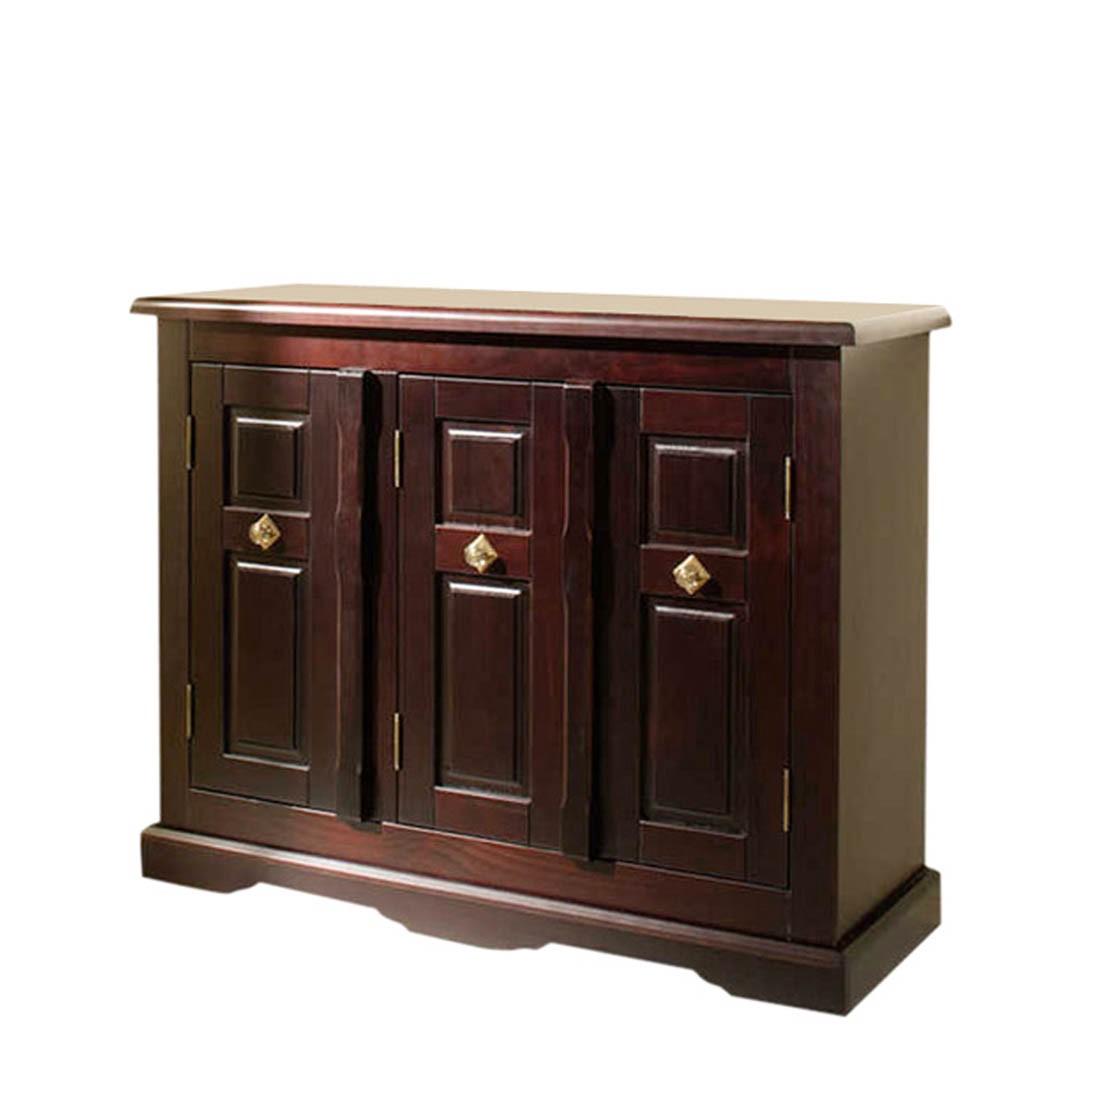 kommode havanna kiefer teilmassiv kolonial schrank. Black Bedroom Furniture Sets. Home Design Ideas